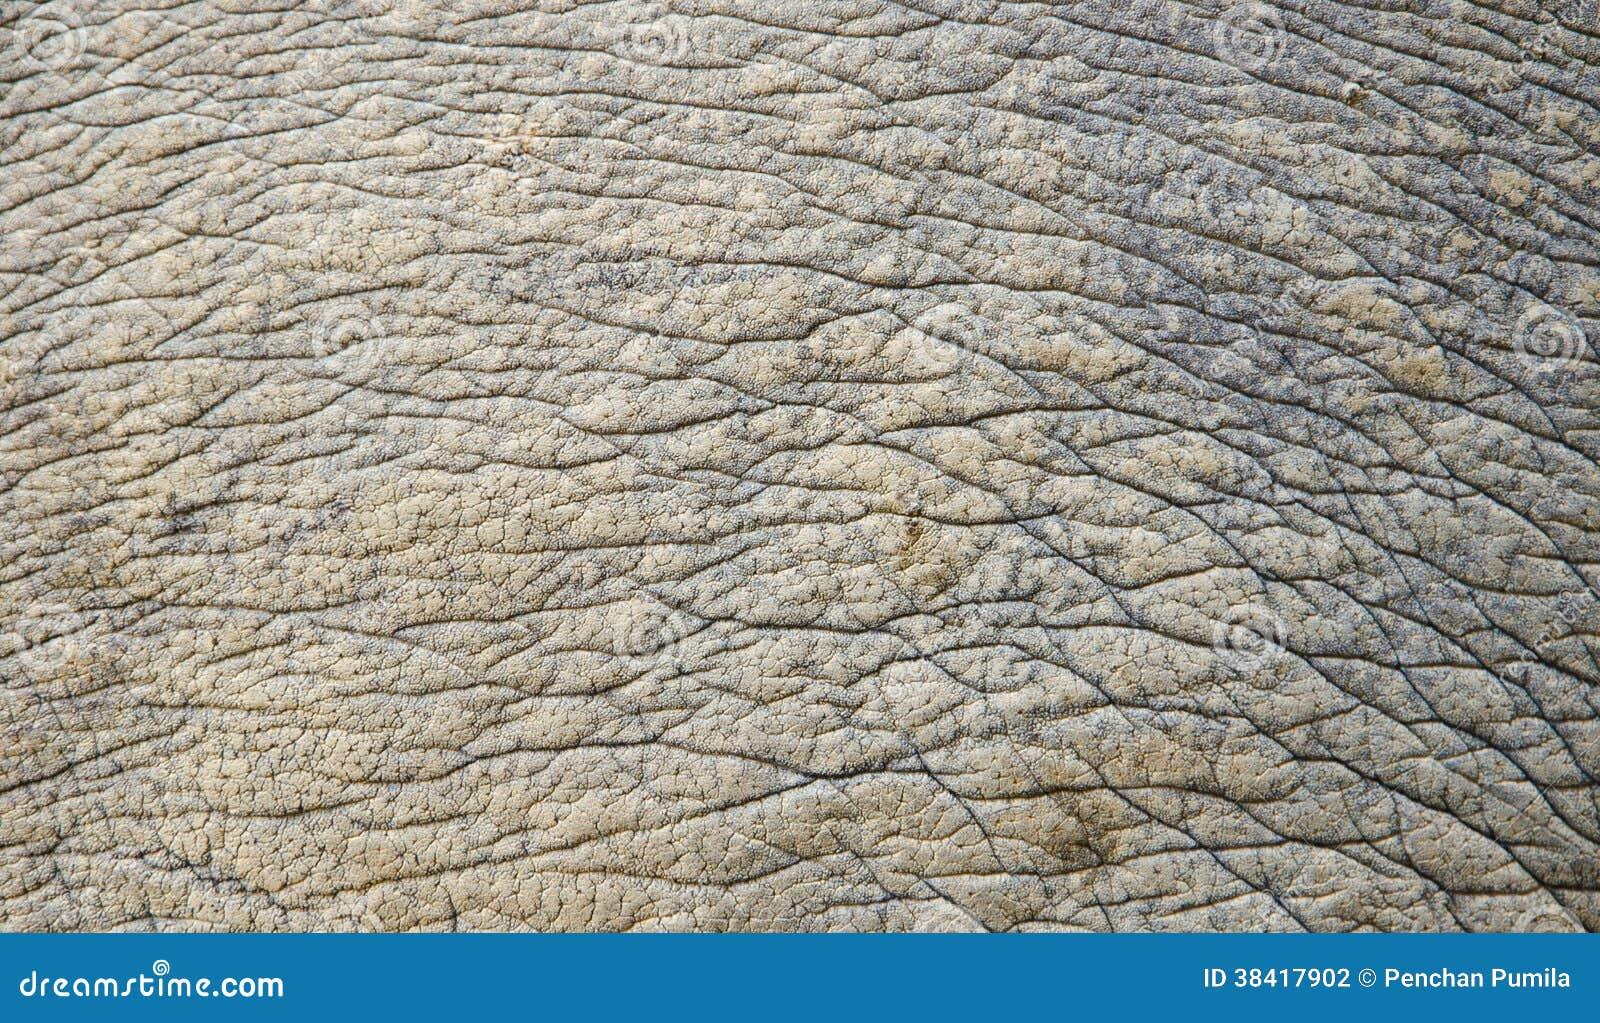 Rhino Skin Texture Stock Photography - Image: 38417902